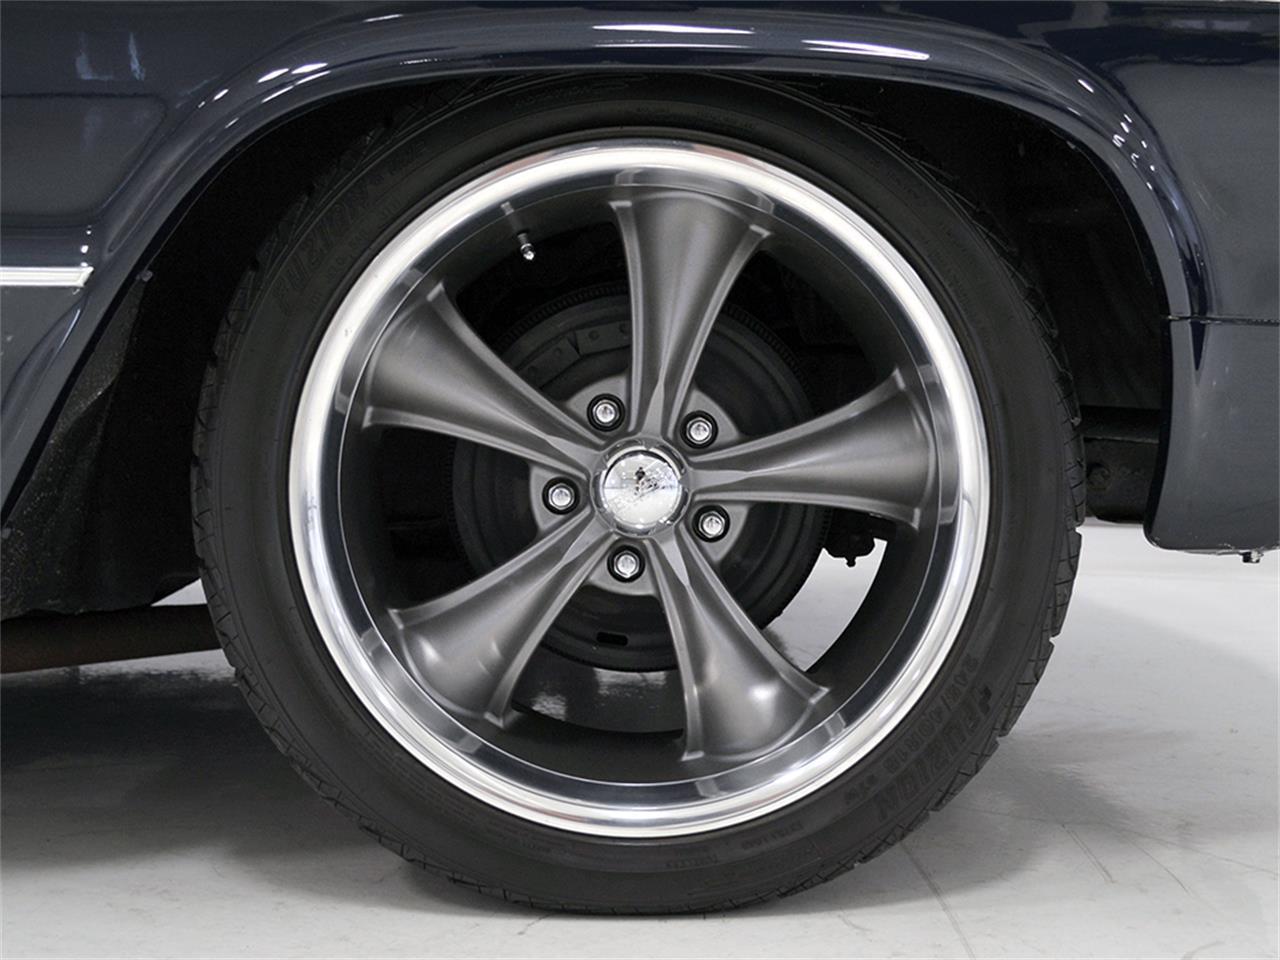 Large Picture of Classic 1964 Chevrolet Impala located in Ohio - $22,900.00 - LEX8